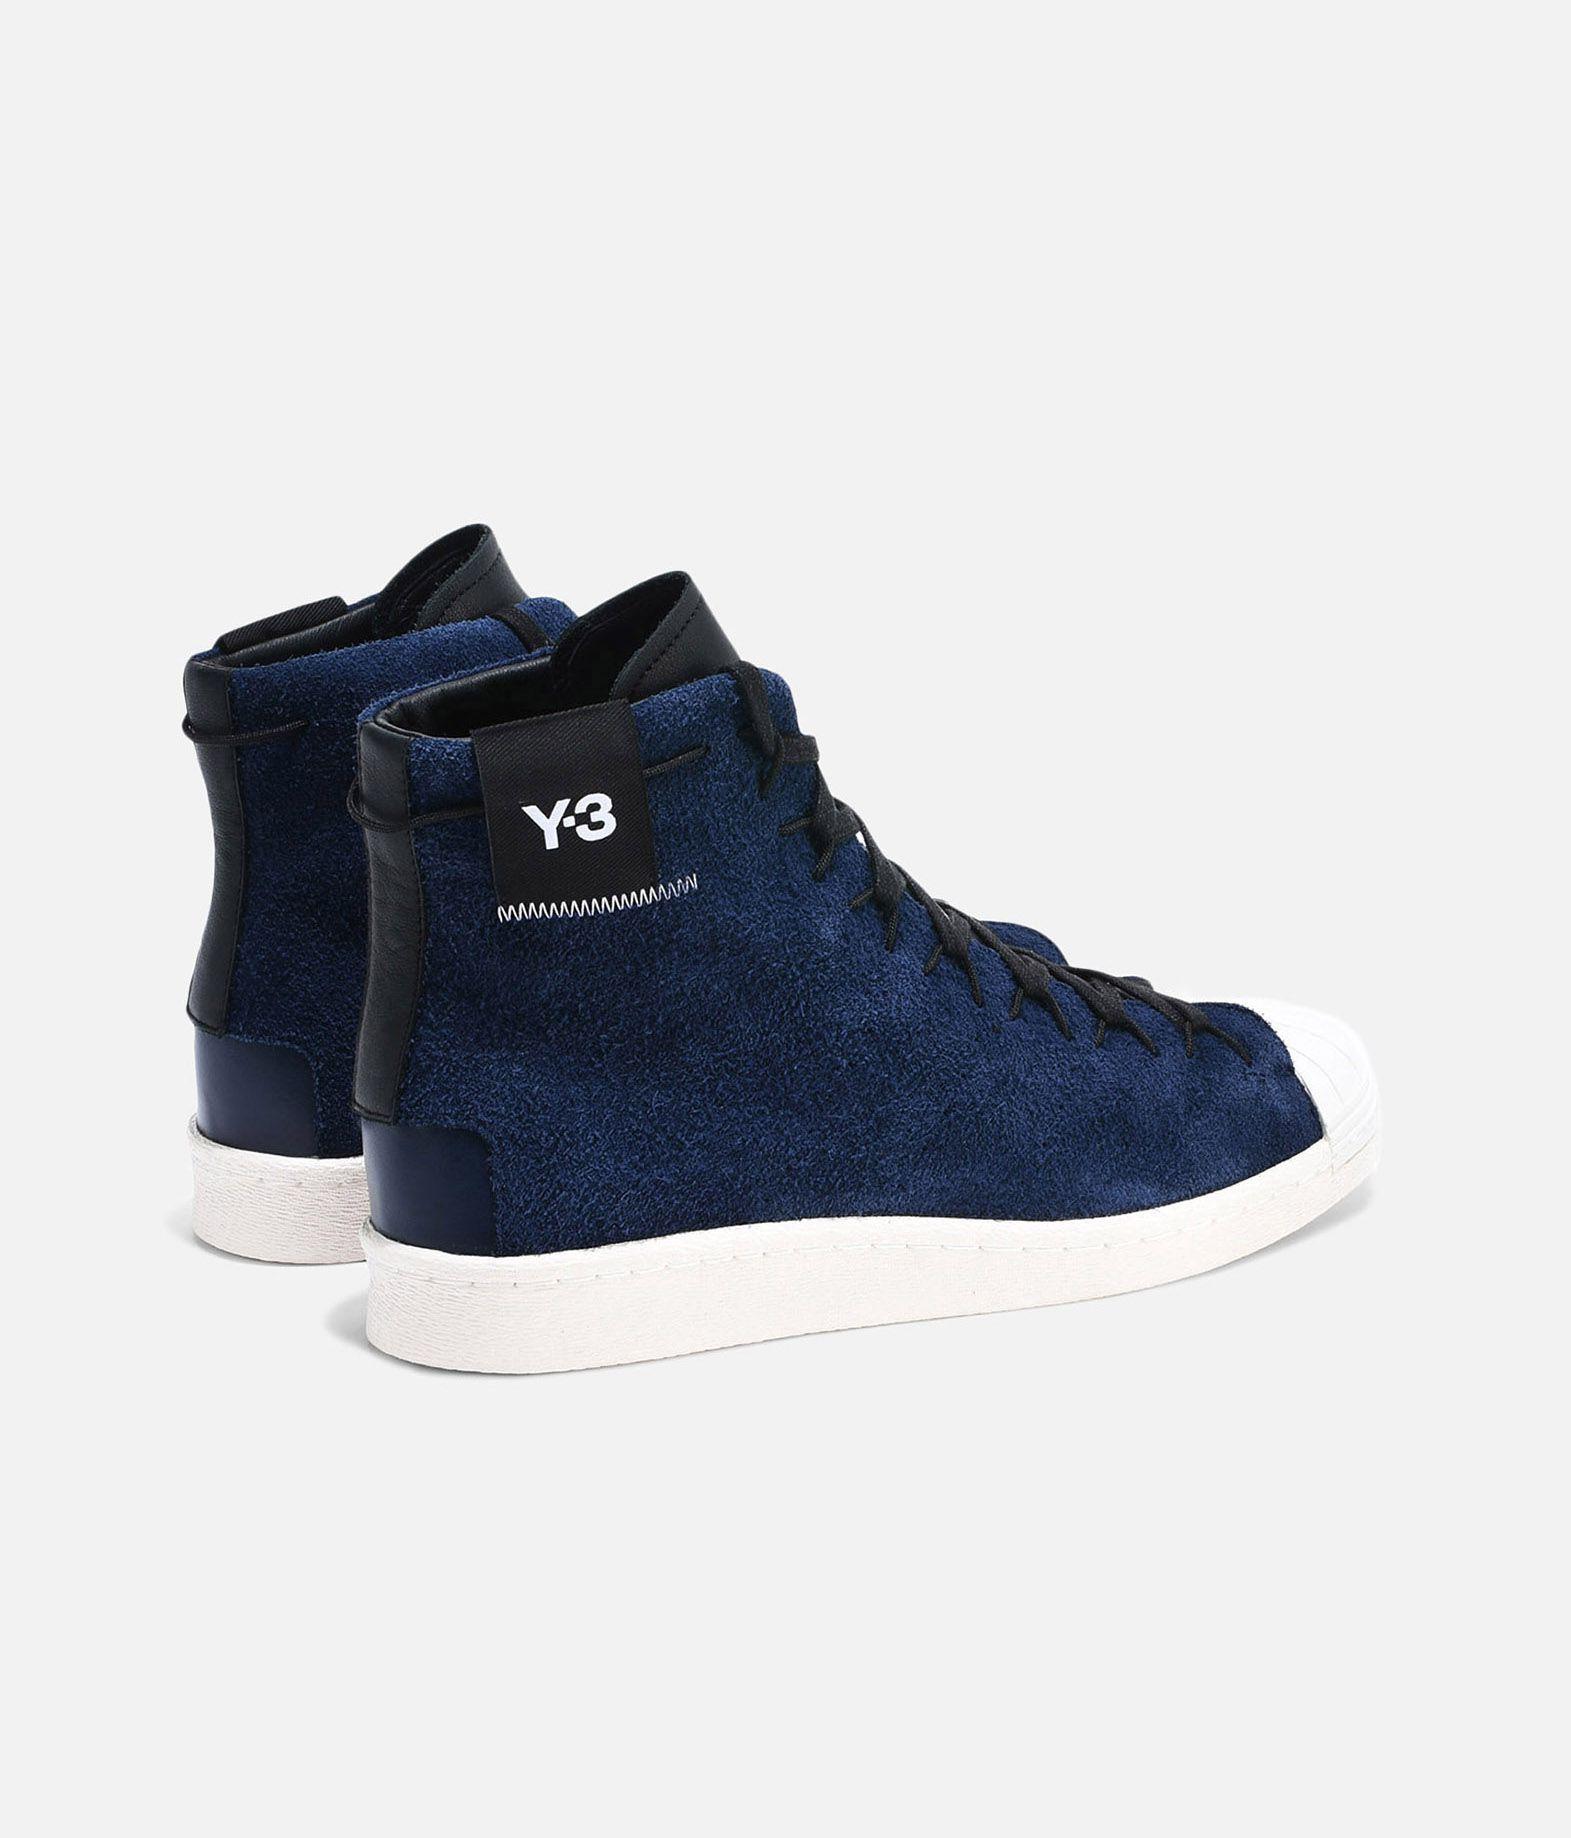 Y-3 Y-3 Super High High-top sneakers E c